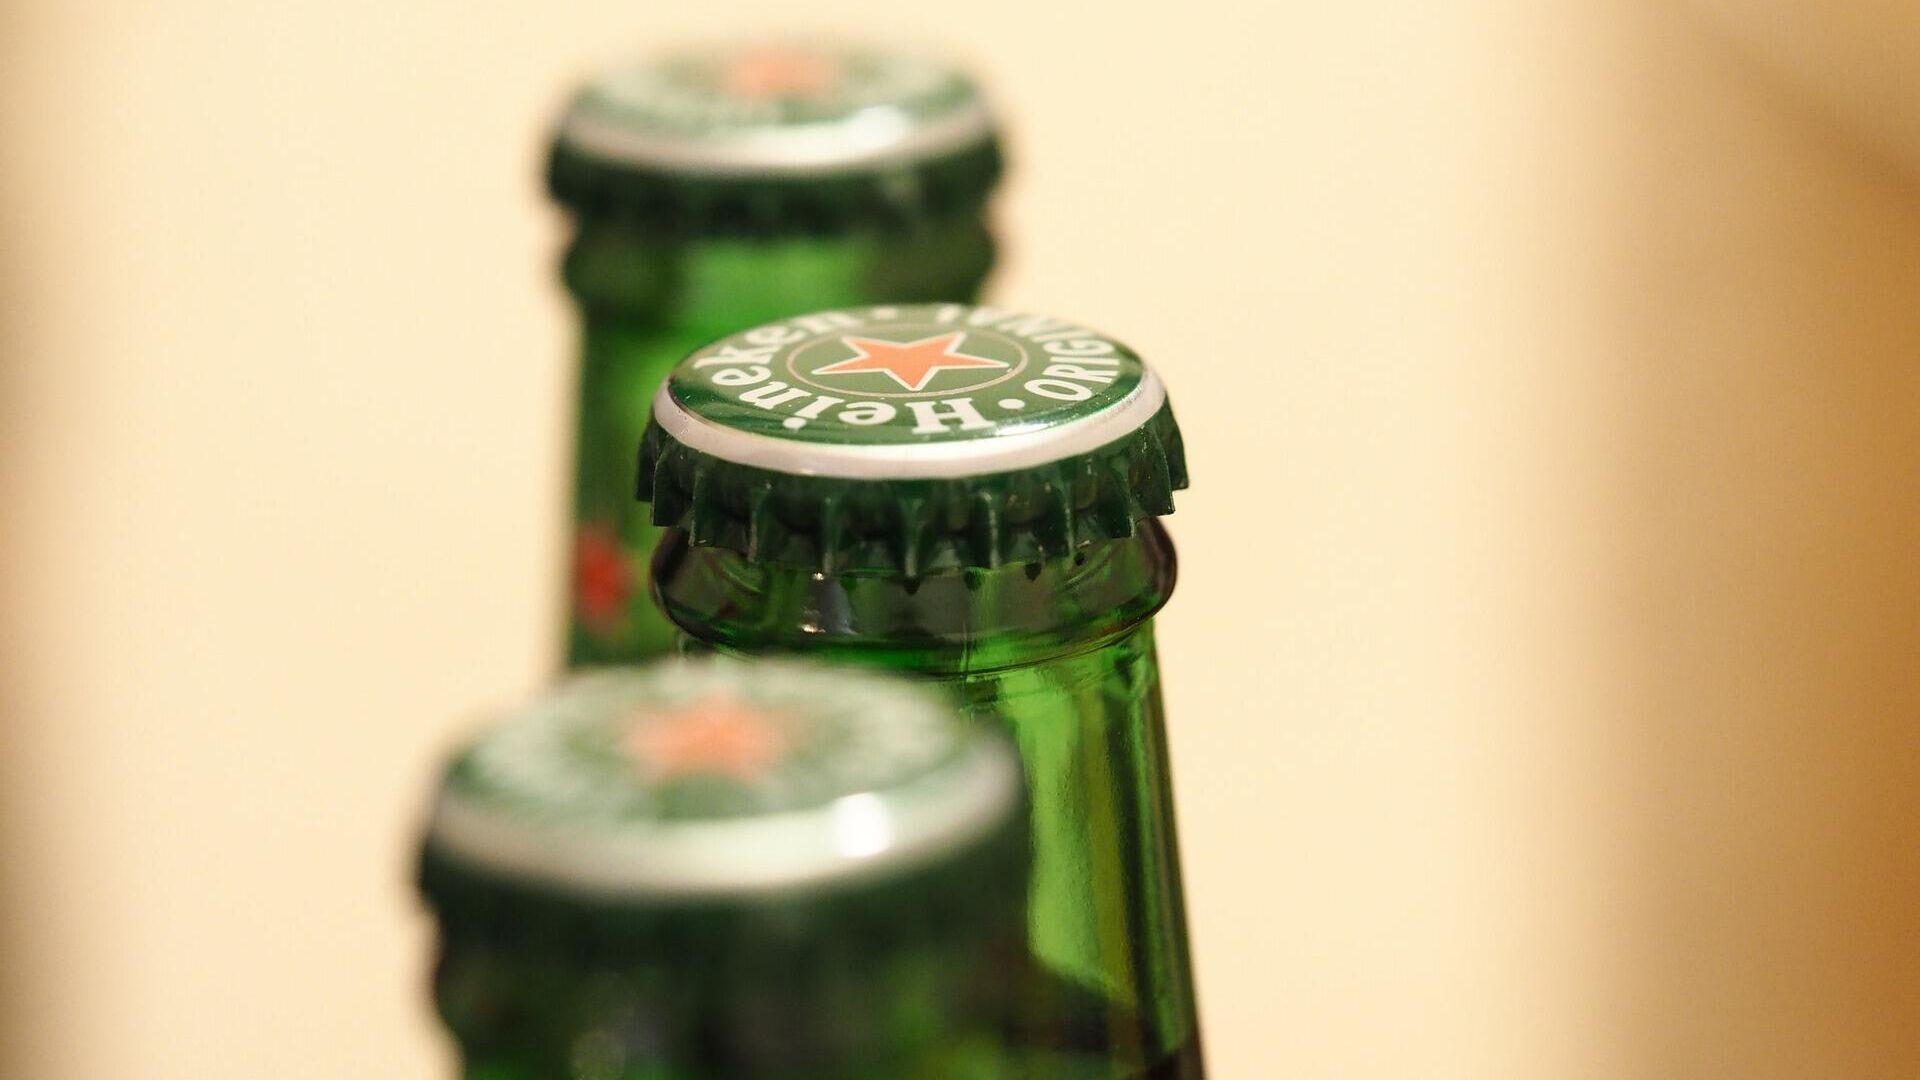 Una botella de Heineken - Sputnik Mundo, 1920, 16.06.2021